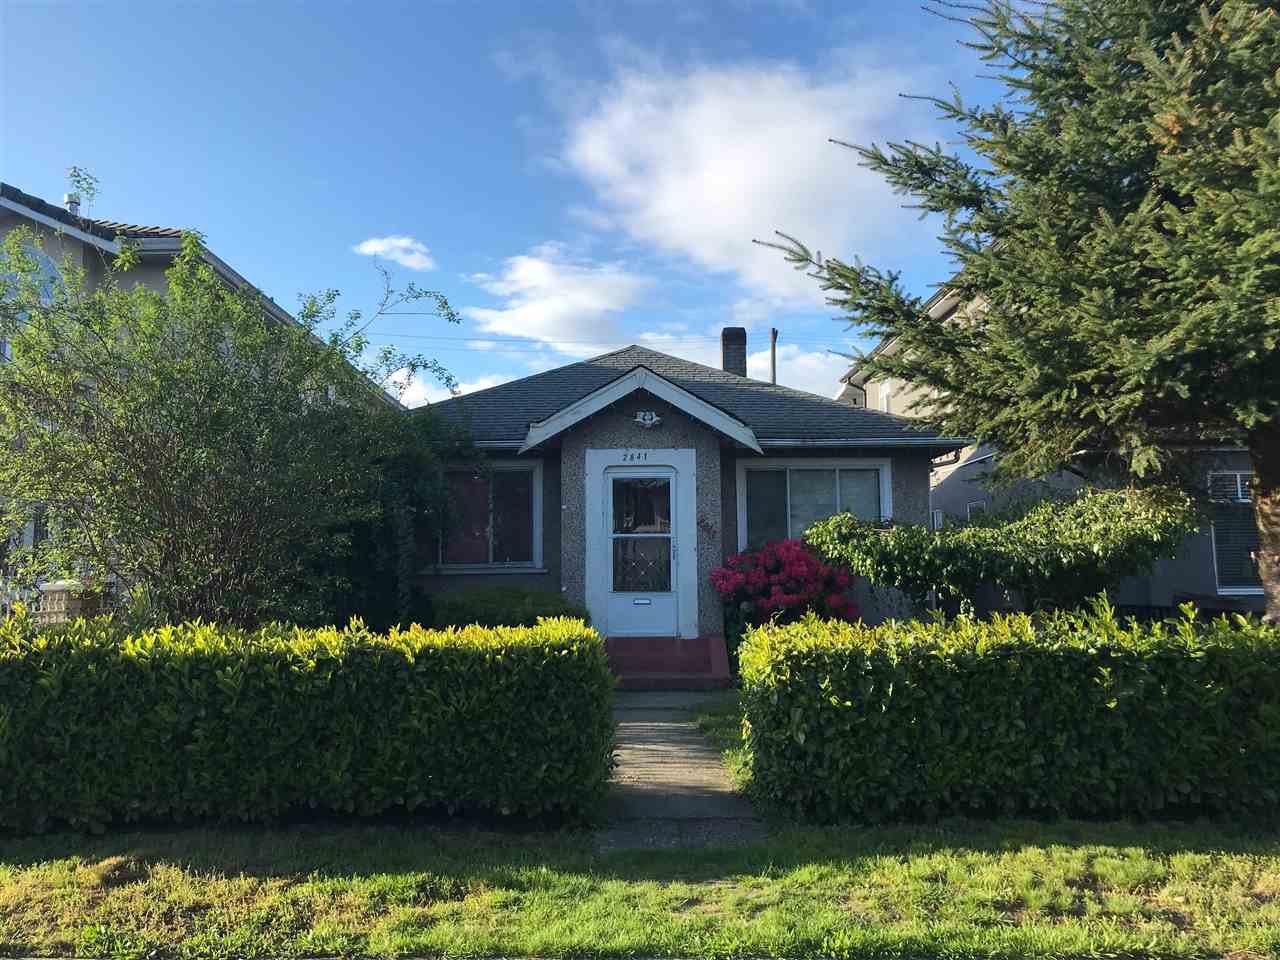 "Main Photo: 2841 E 14TH Avenue in Vancouver: Renfrew Heights House for sale in ""RENFREW HEIGHTS"" (Vancouver East)  : MLS®# R2278987"